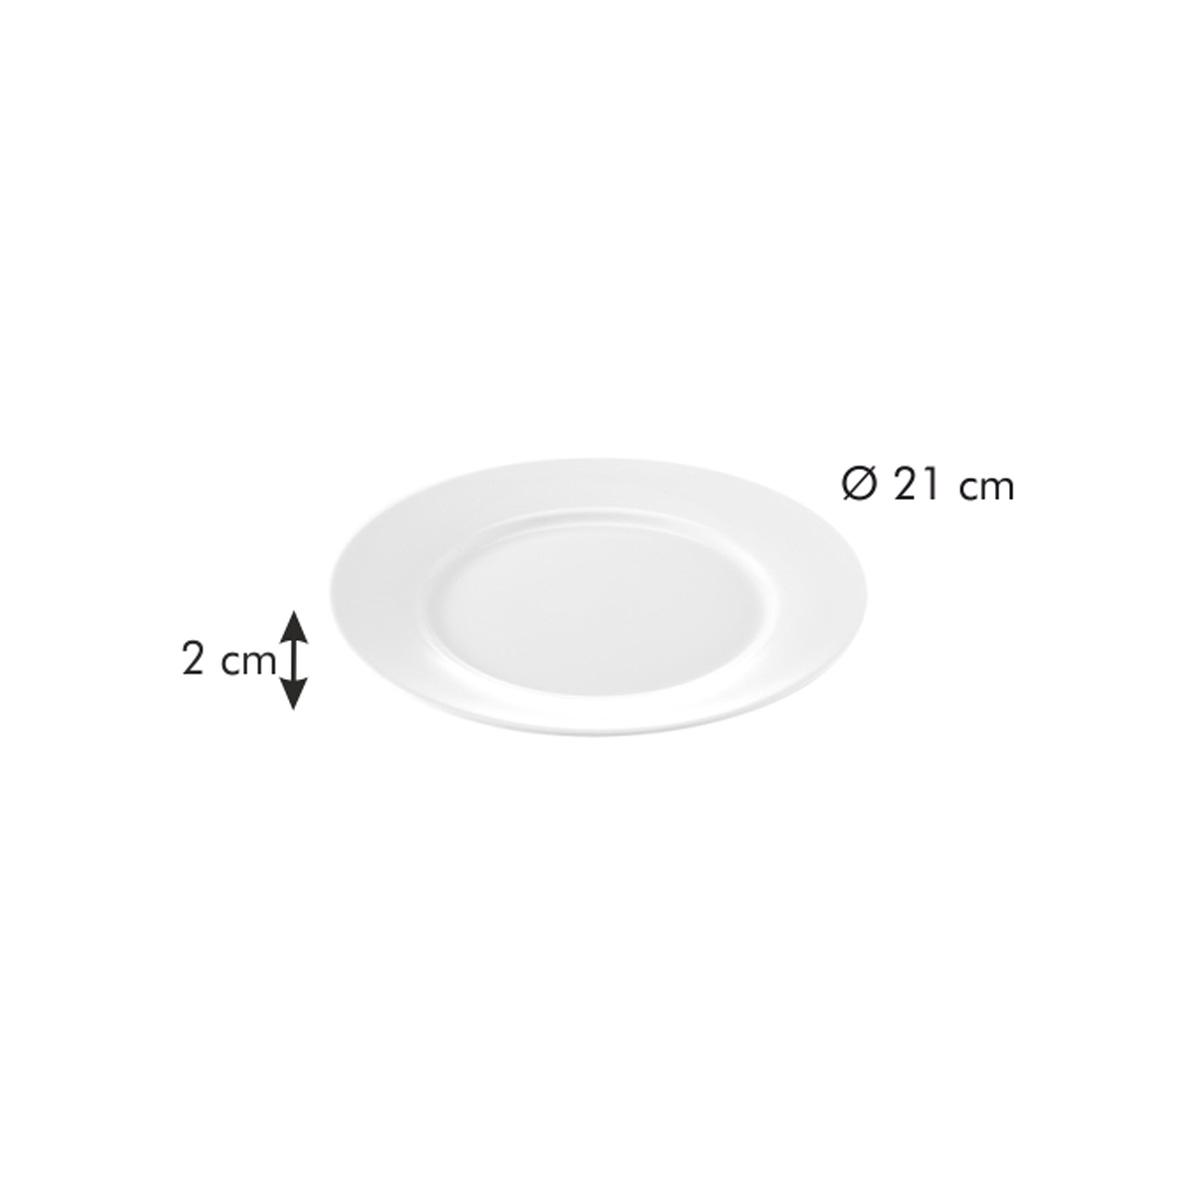 Dezertní talíř LEGEND ø 21 cm